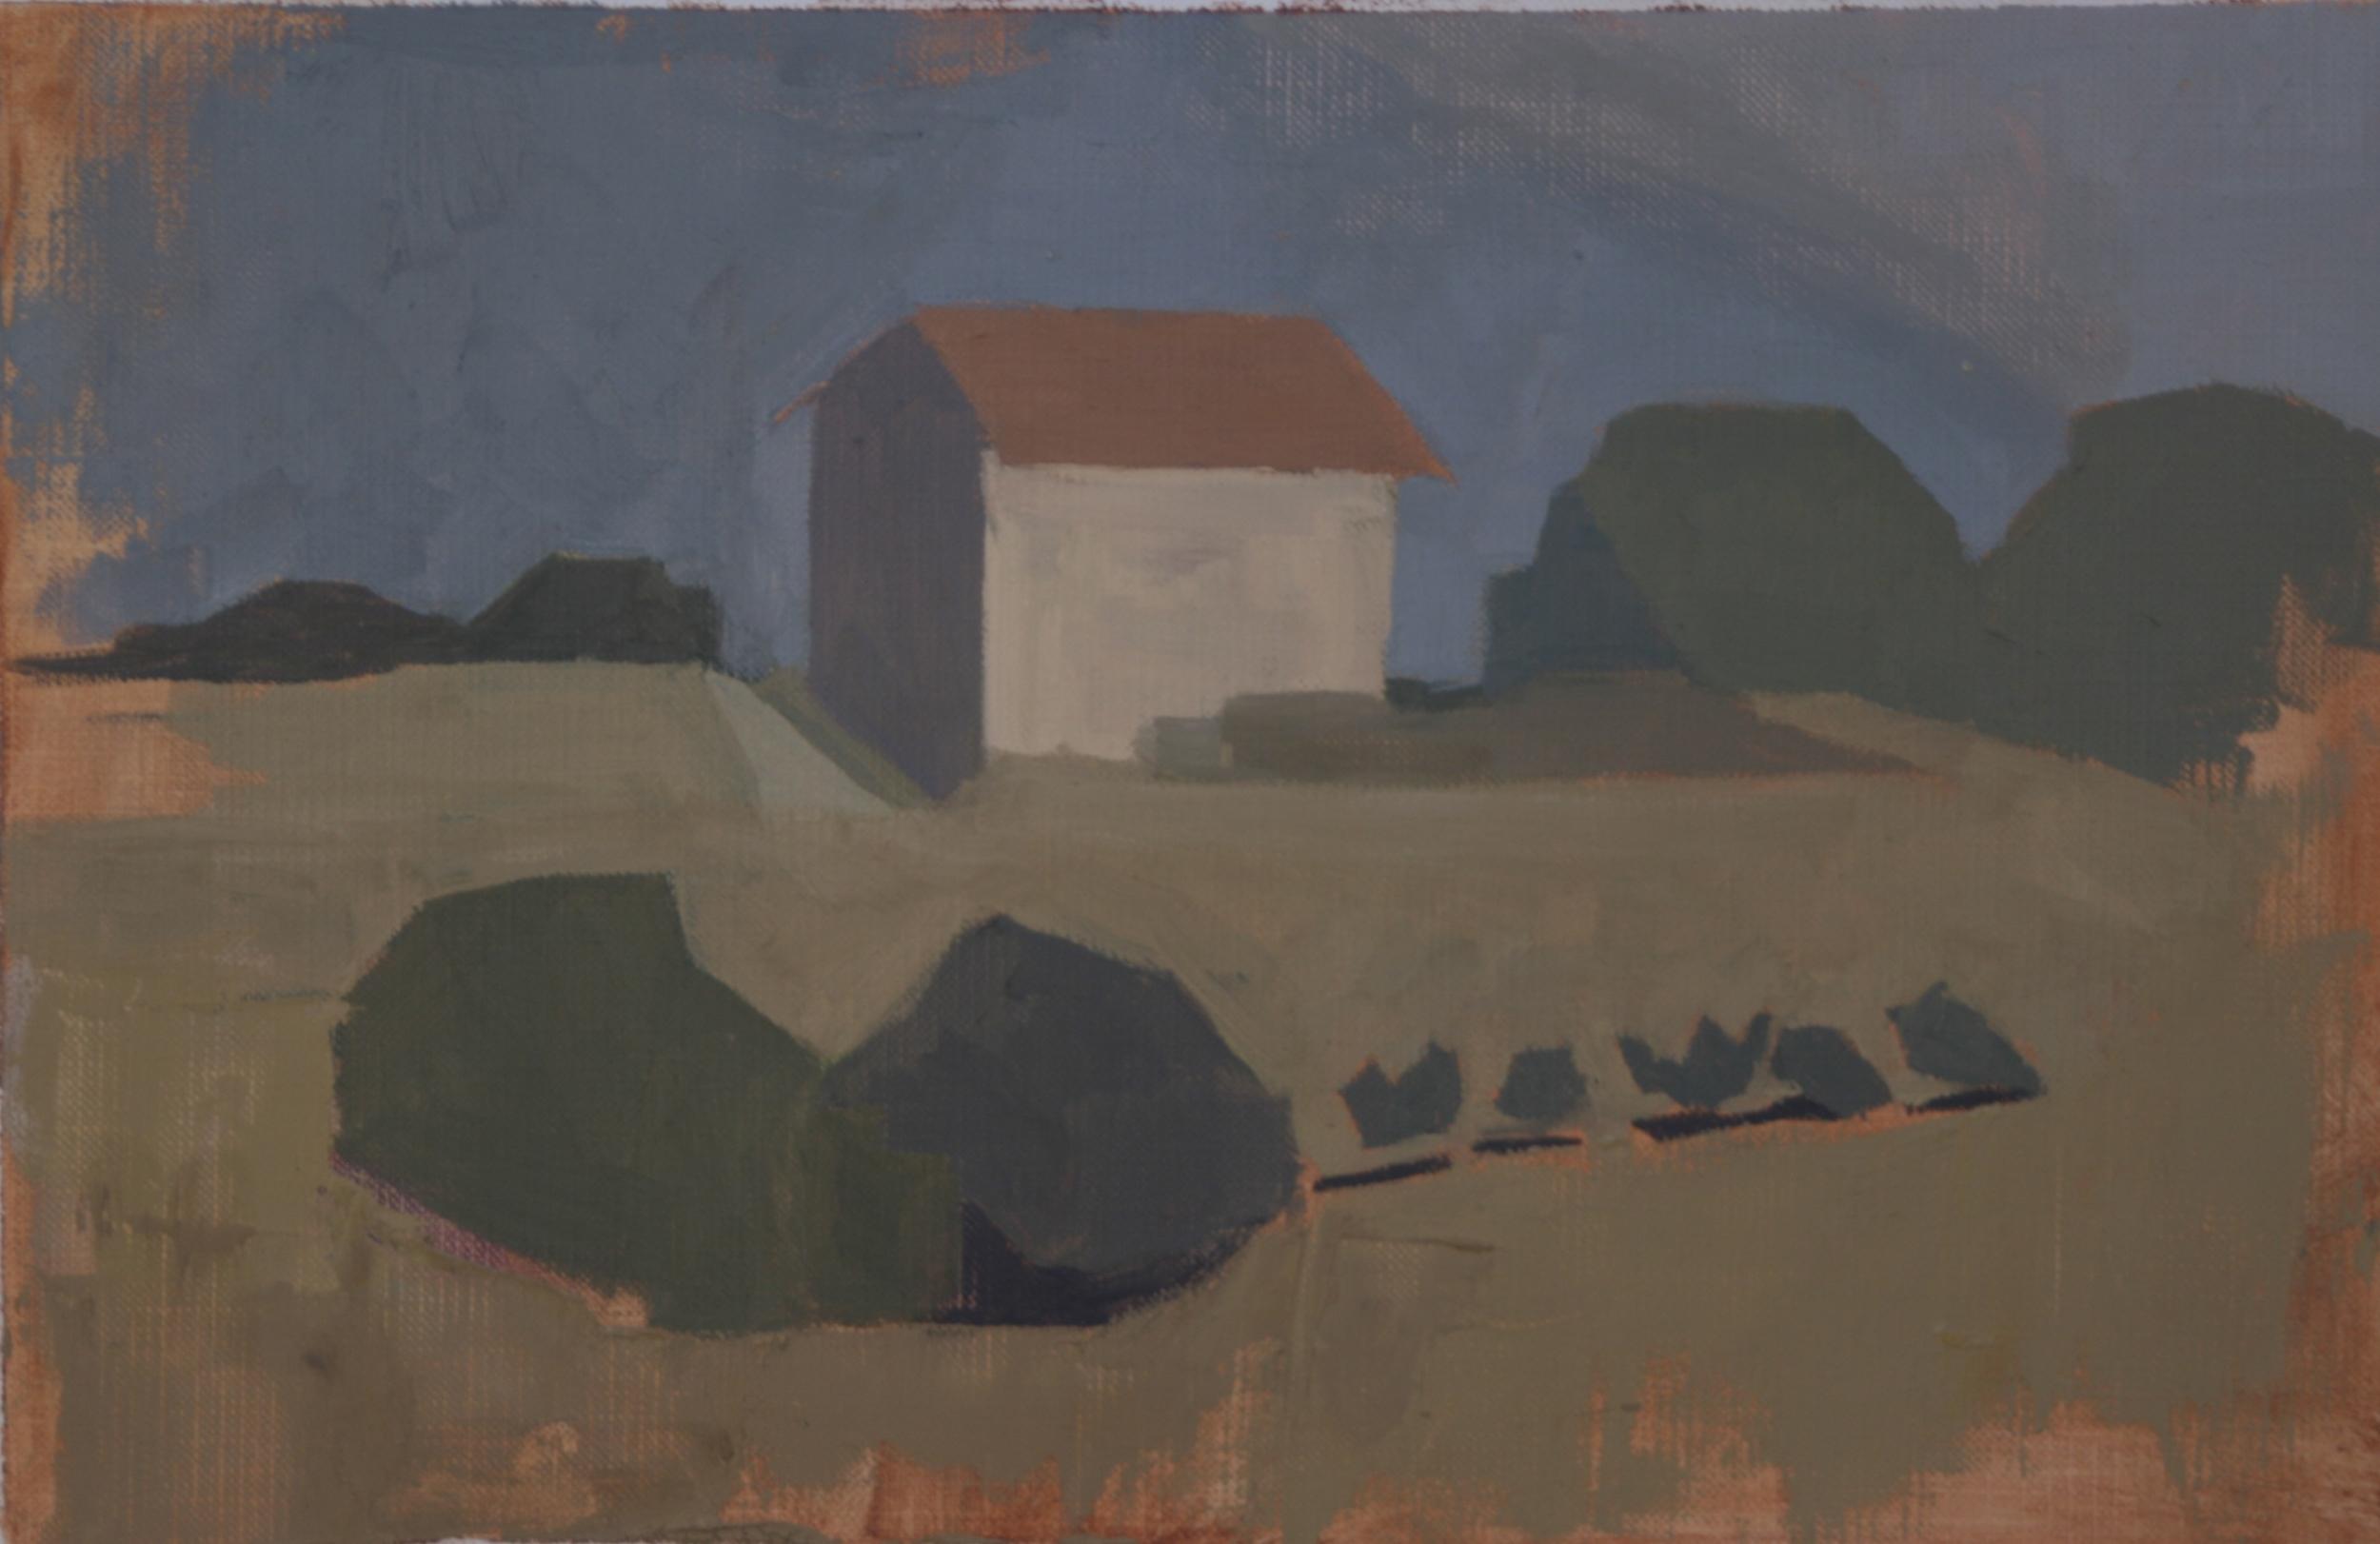 Sketch: Farmhouse at a distance